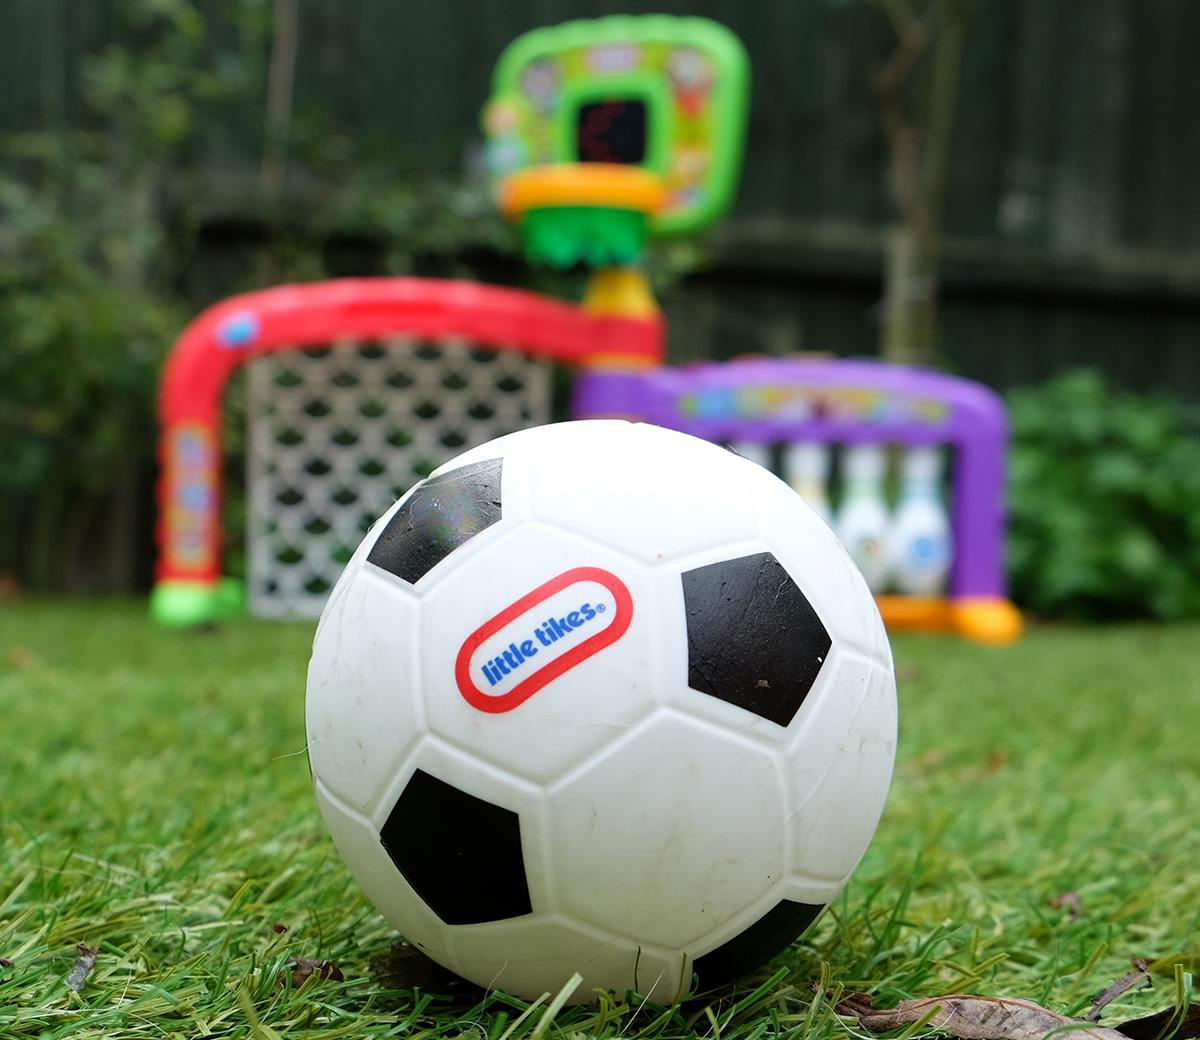 Citaten Sport Zone : Fantastic firsts in sports zone little tikes